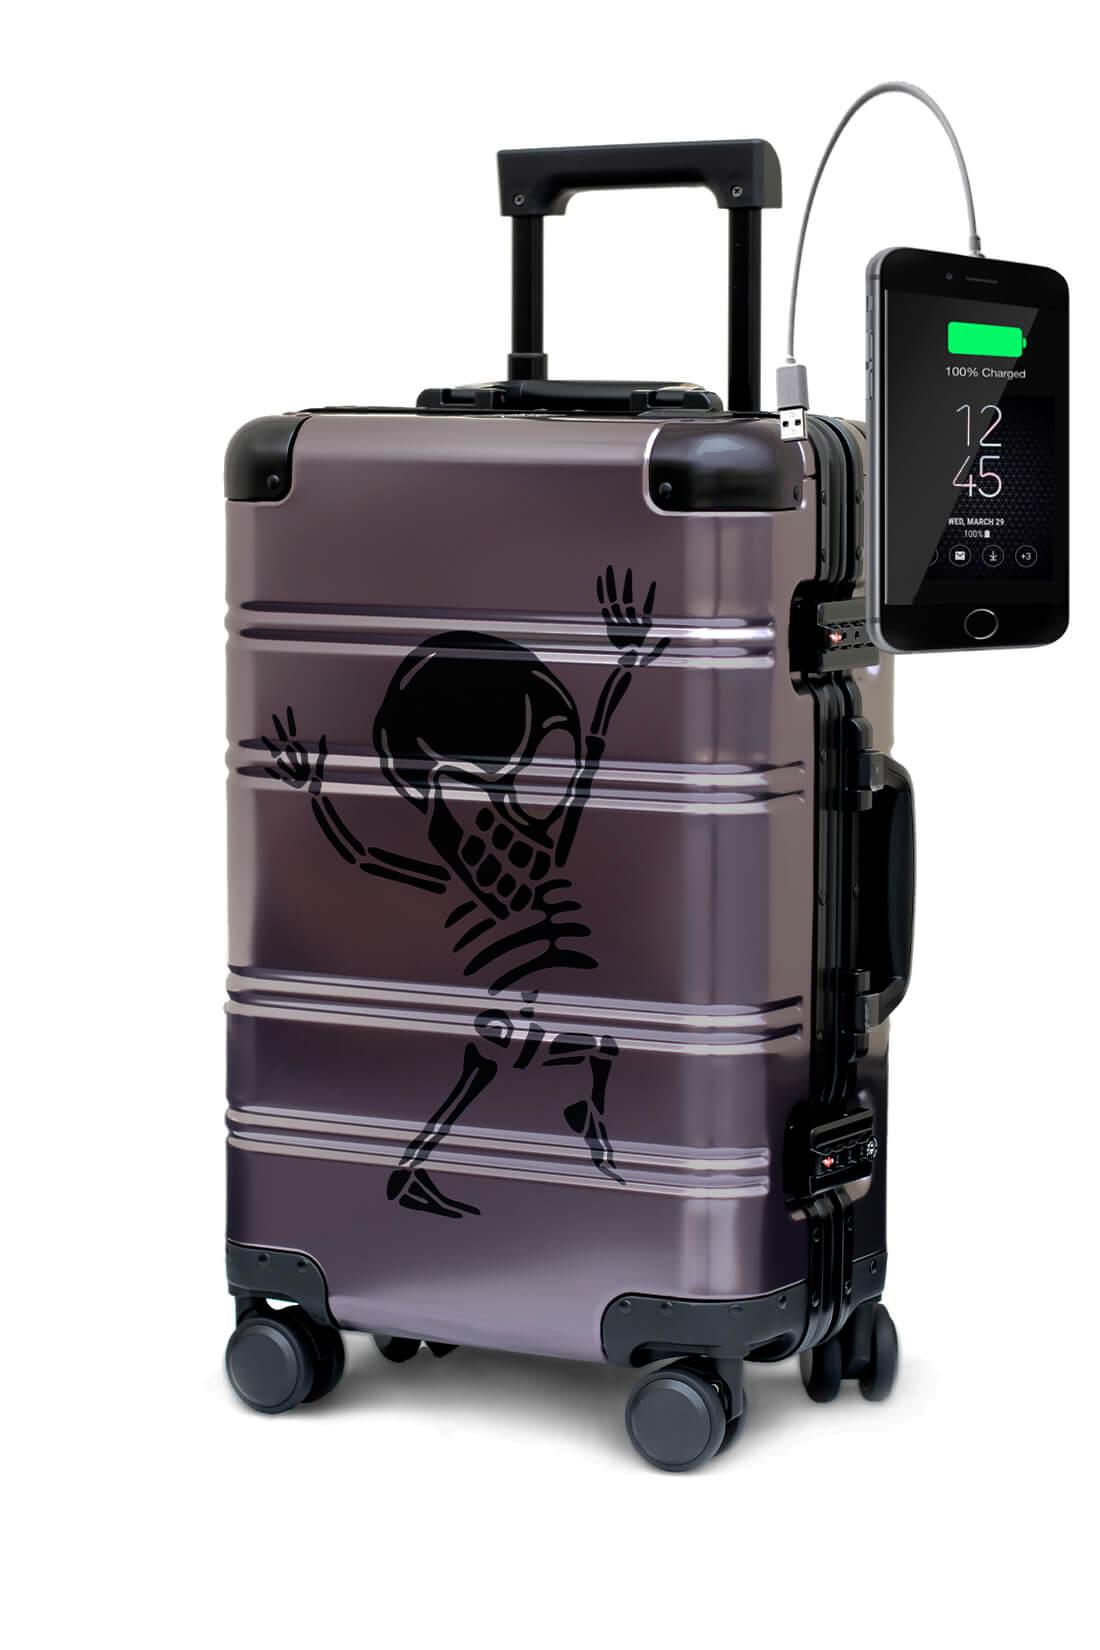 Aluminium Valise Online Cabine Trolley TOKYOTO LUGGAGE Modelle Money Heist 2